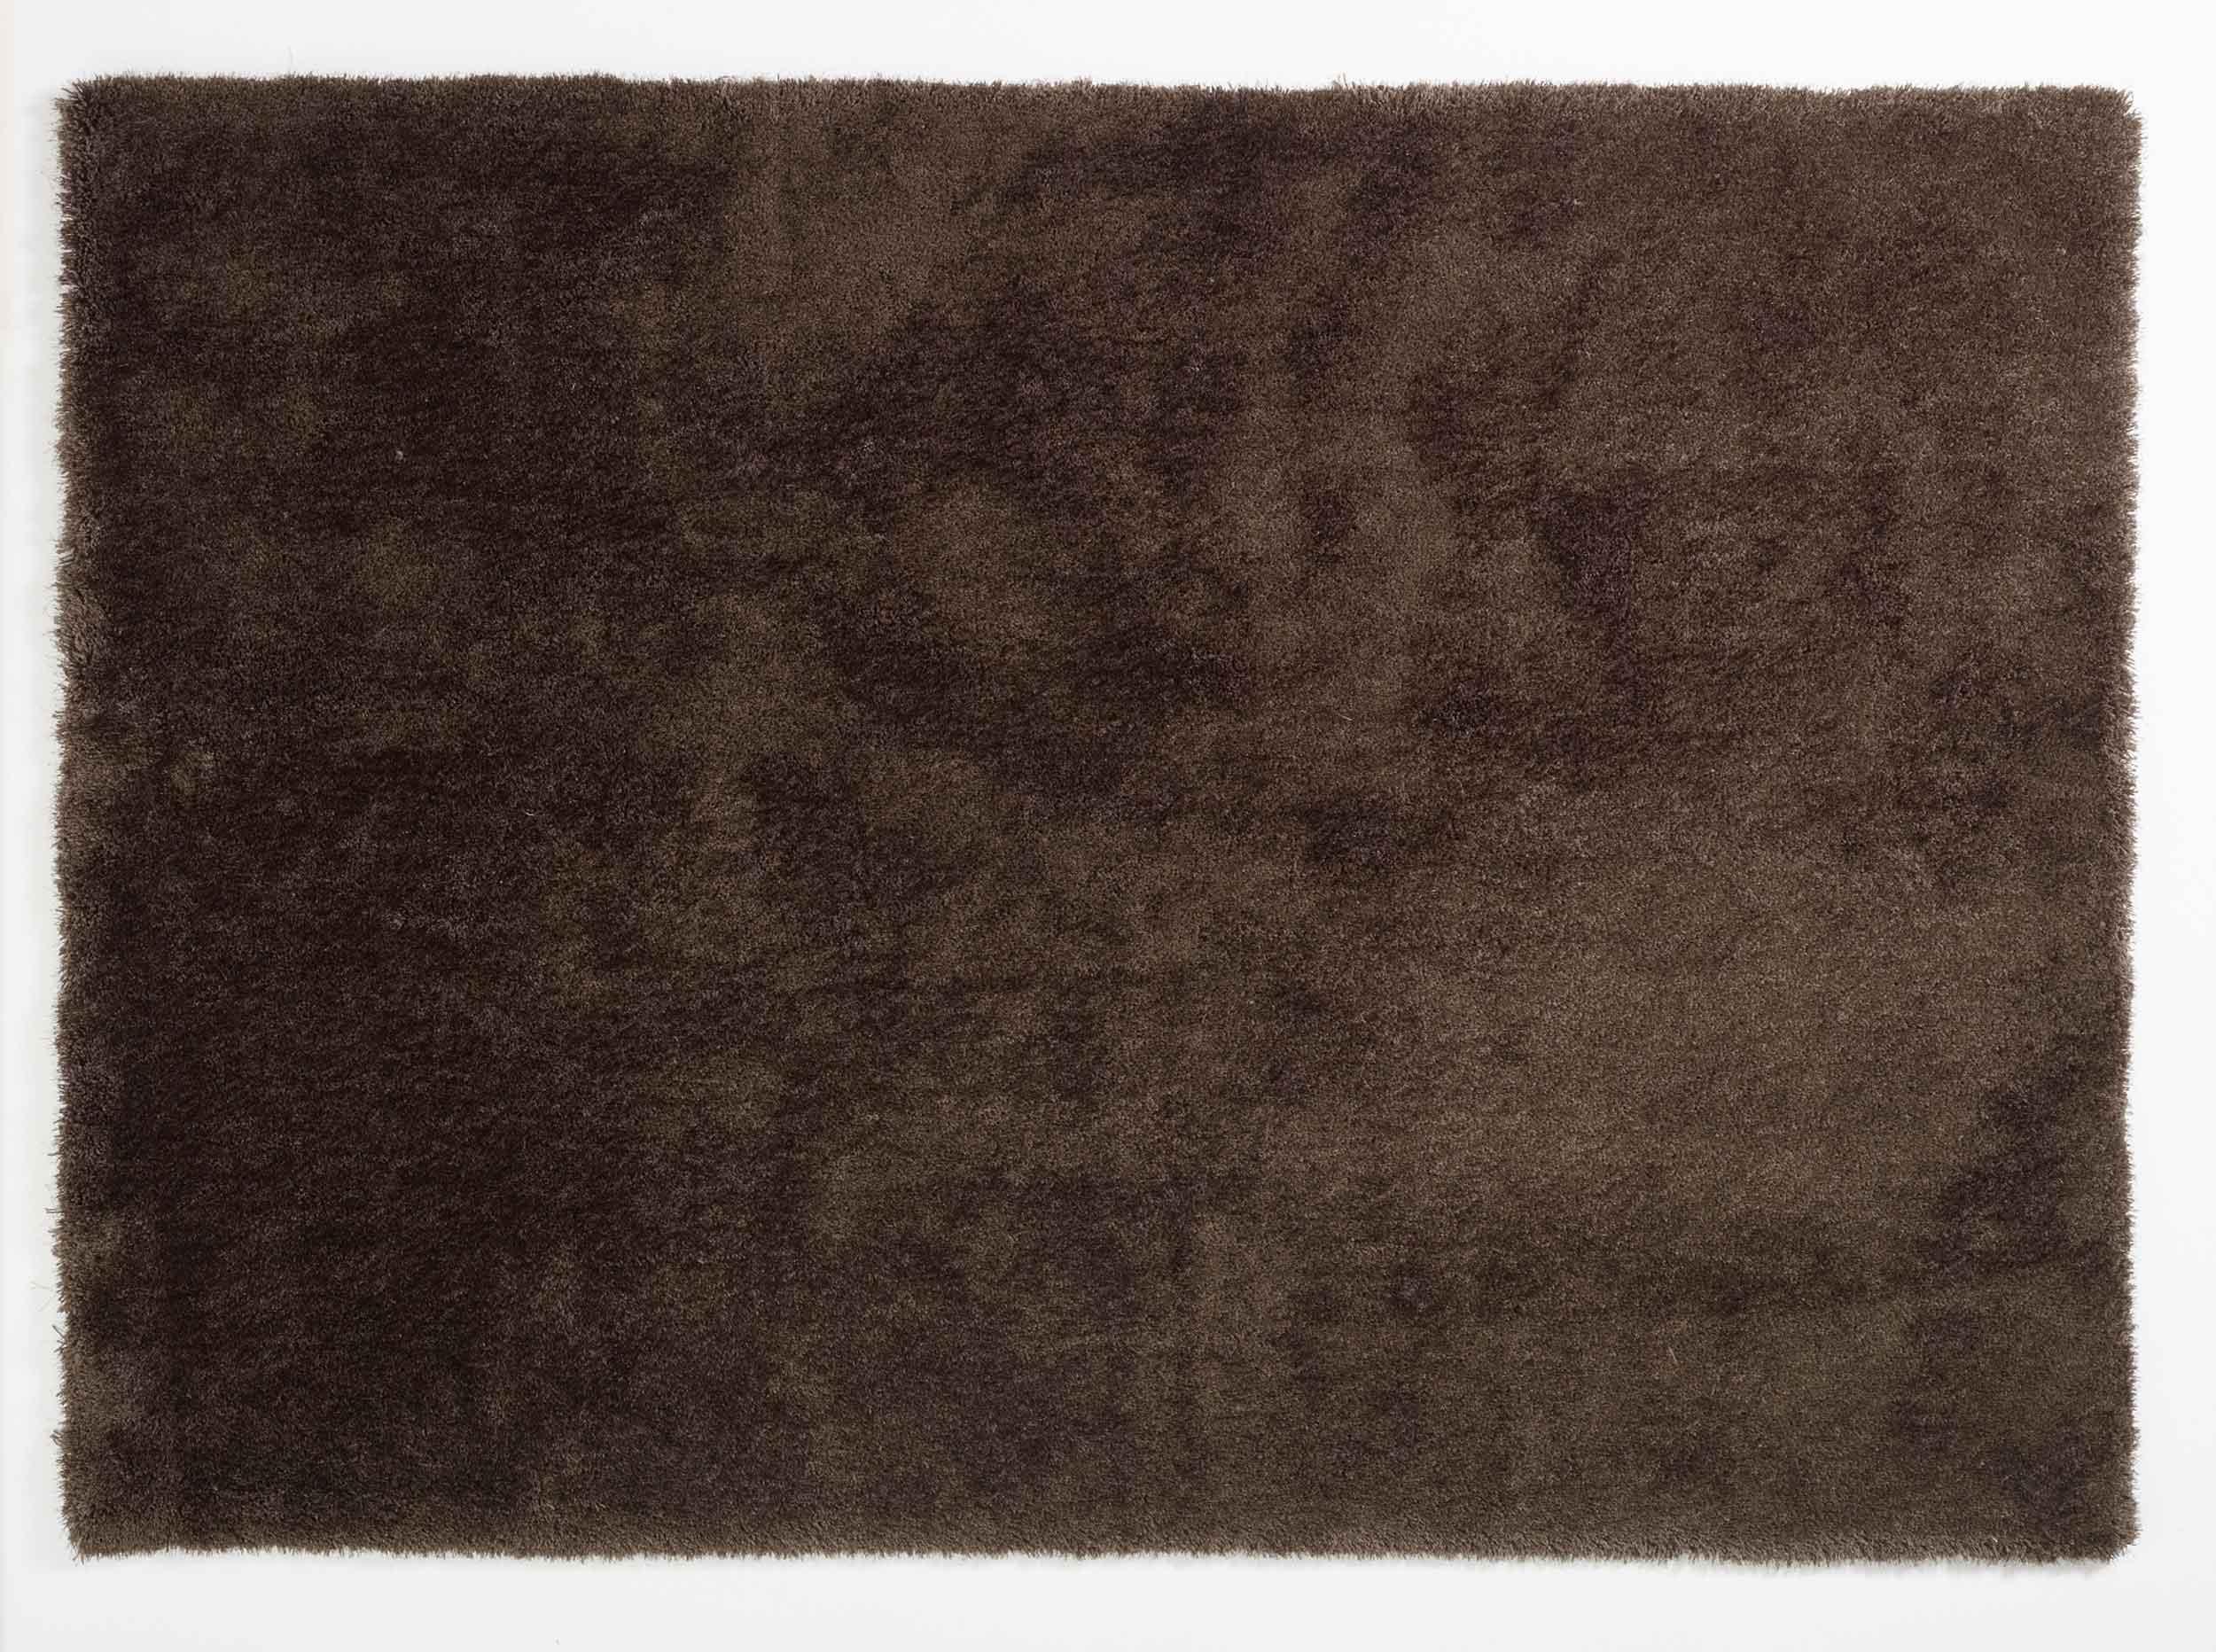 Teppich cc 70x140cm      COLOURCOURAGE